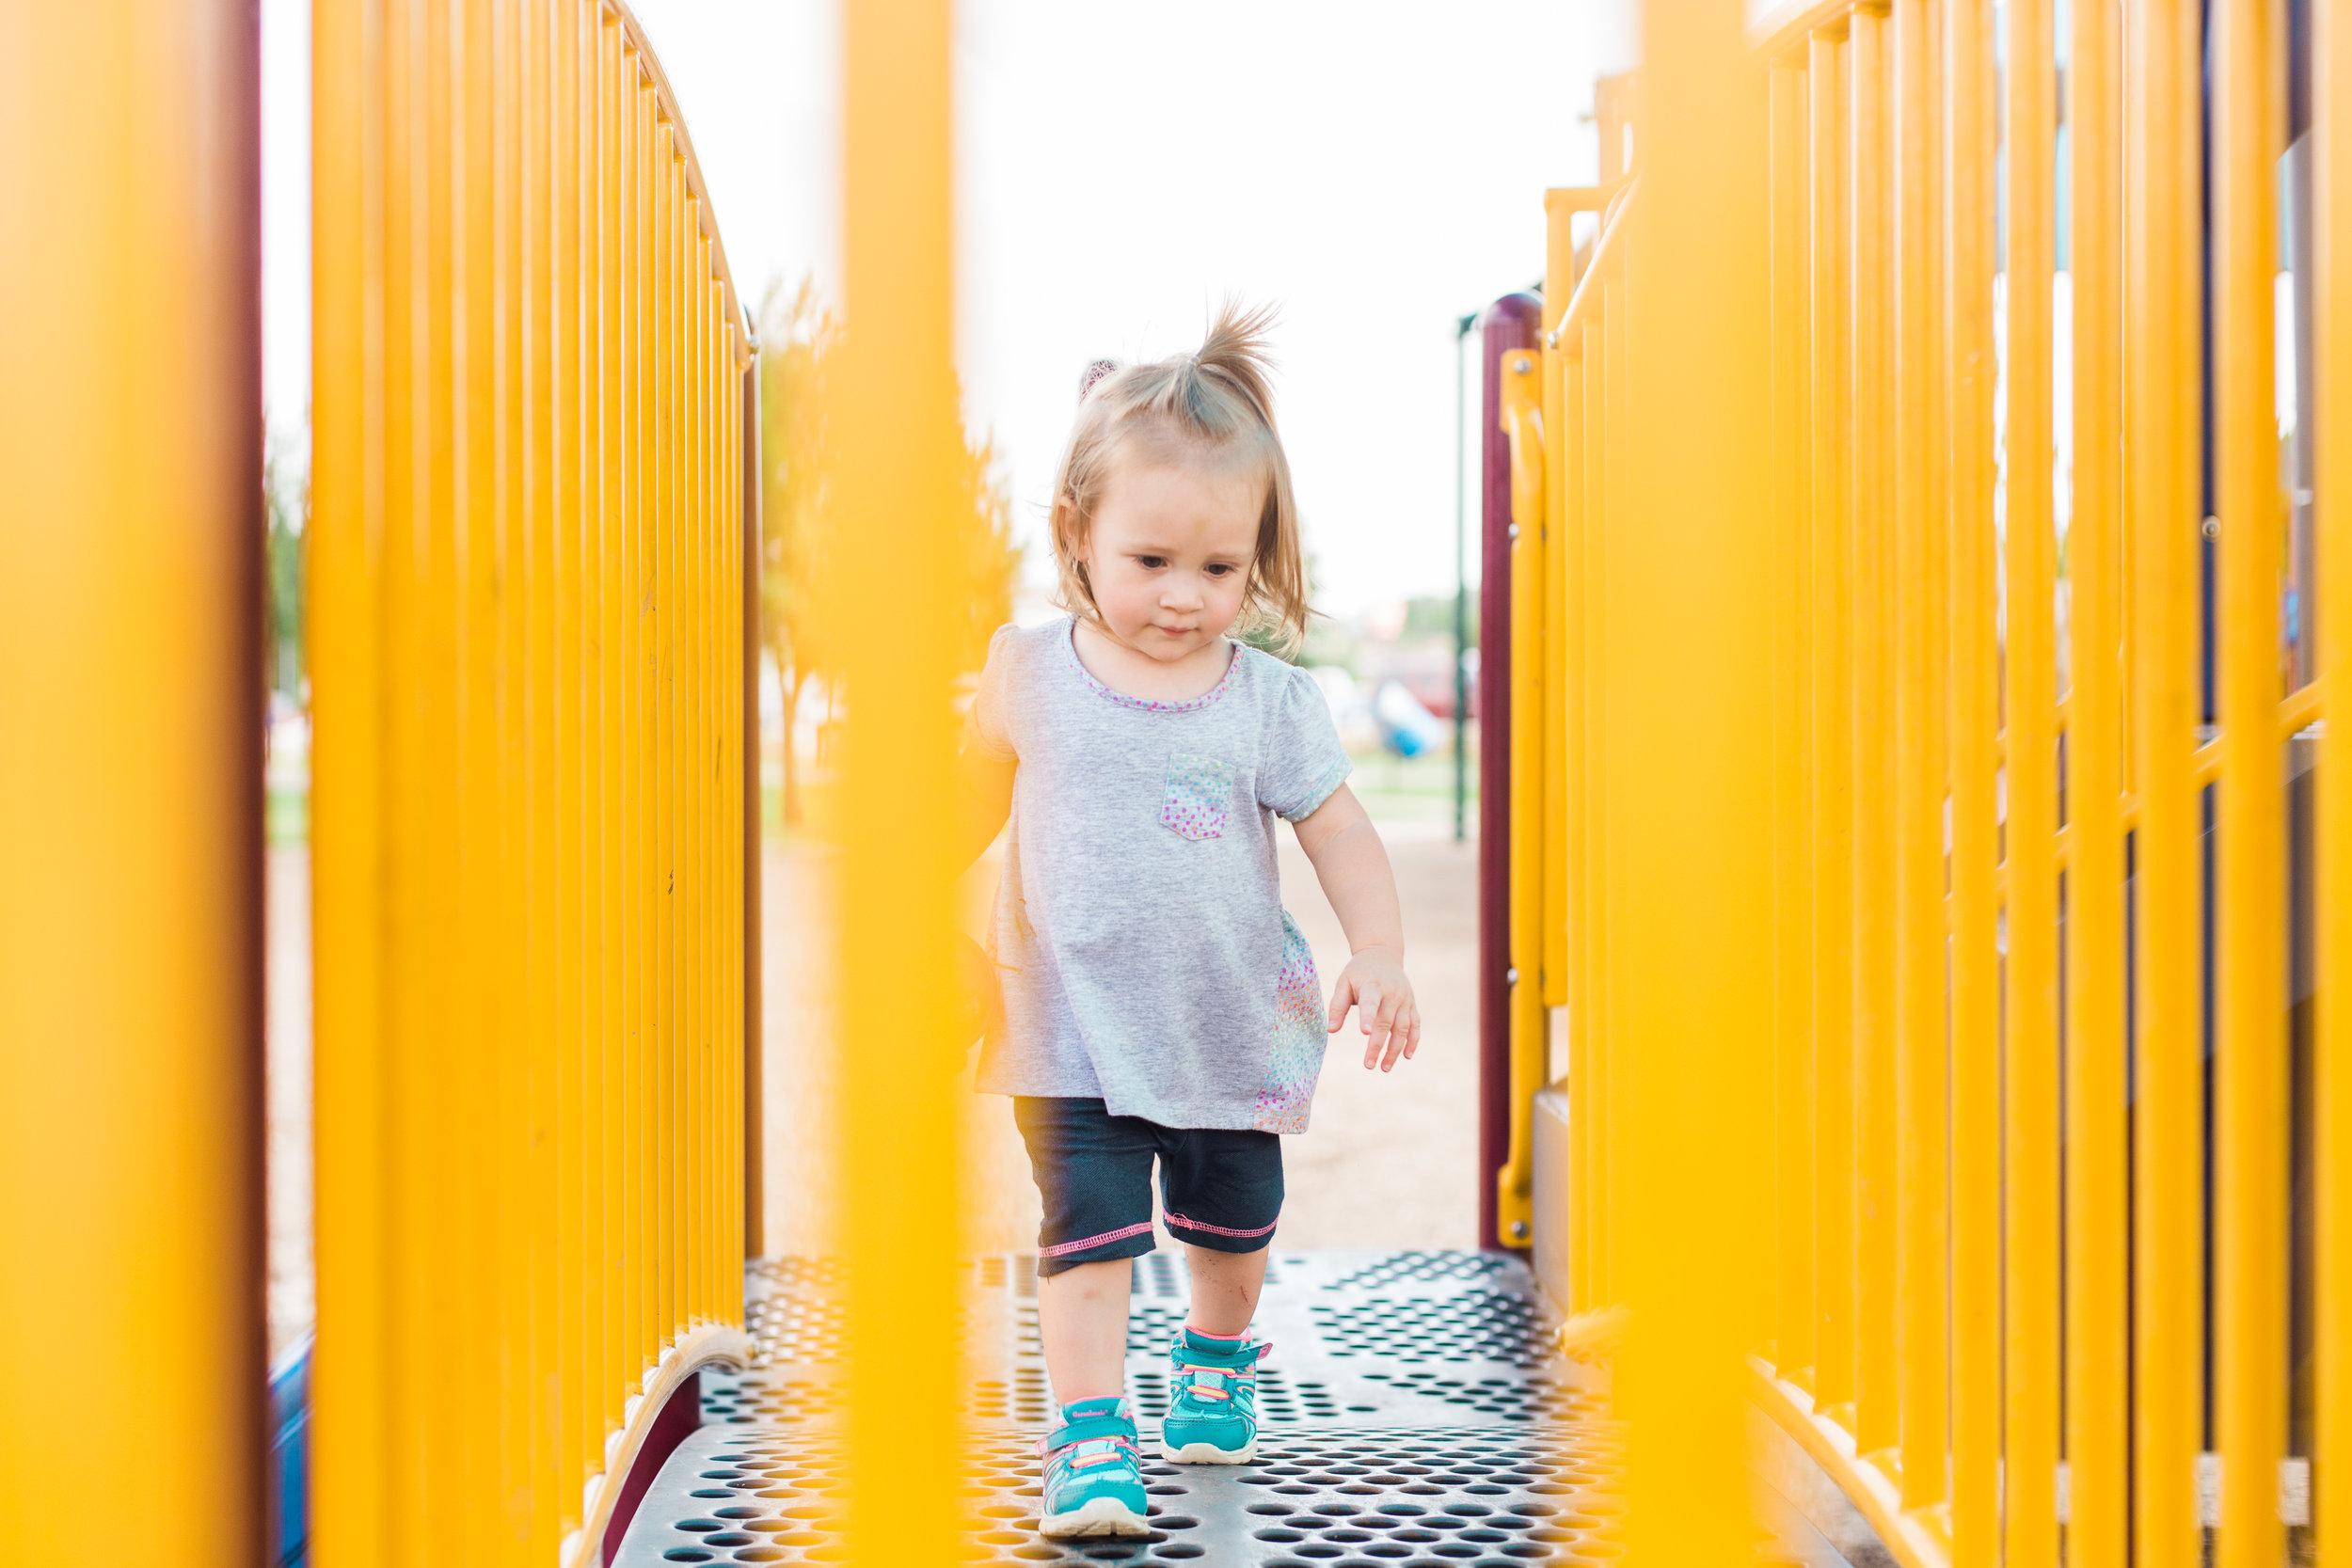 all your heart photography - killeen fort hood texas family photographer-13.jpg